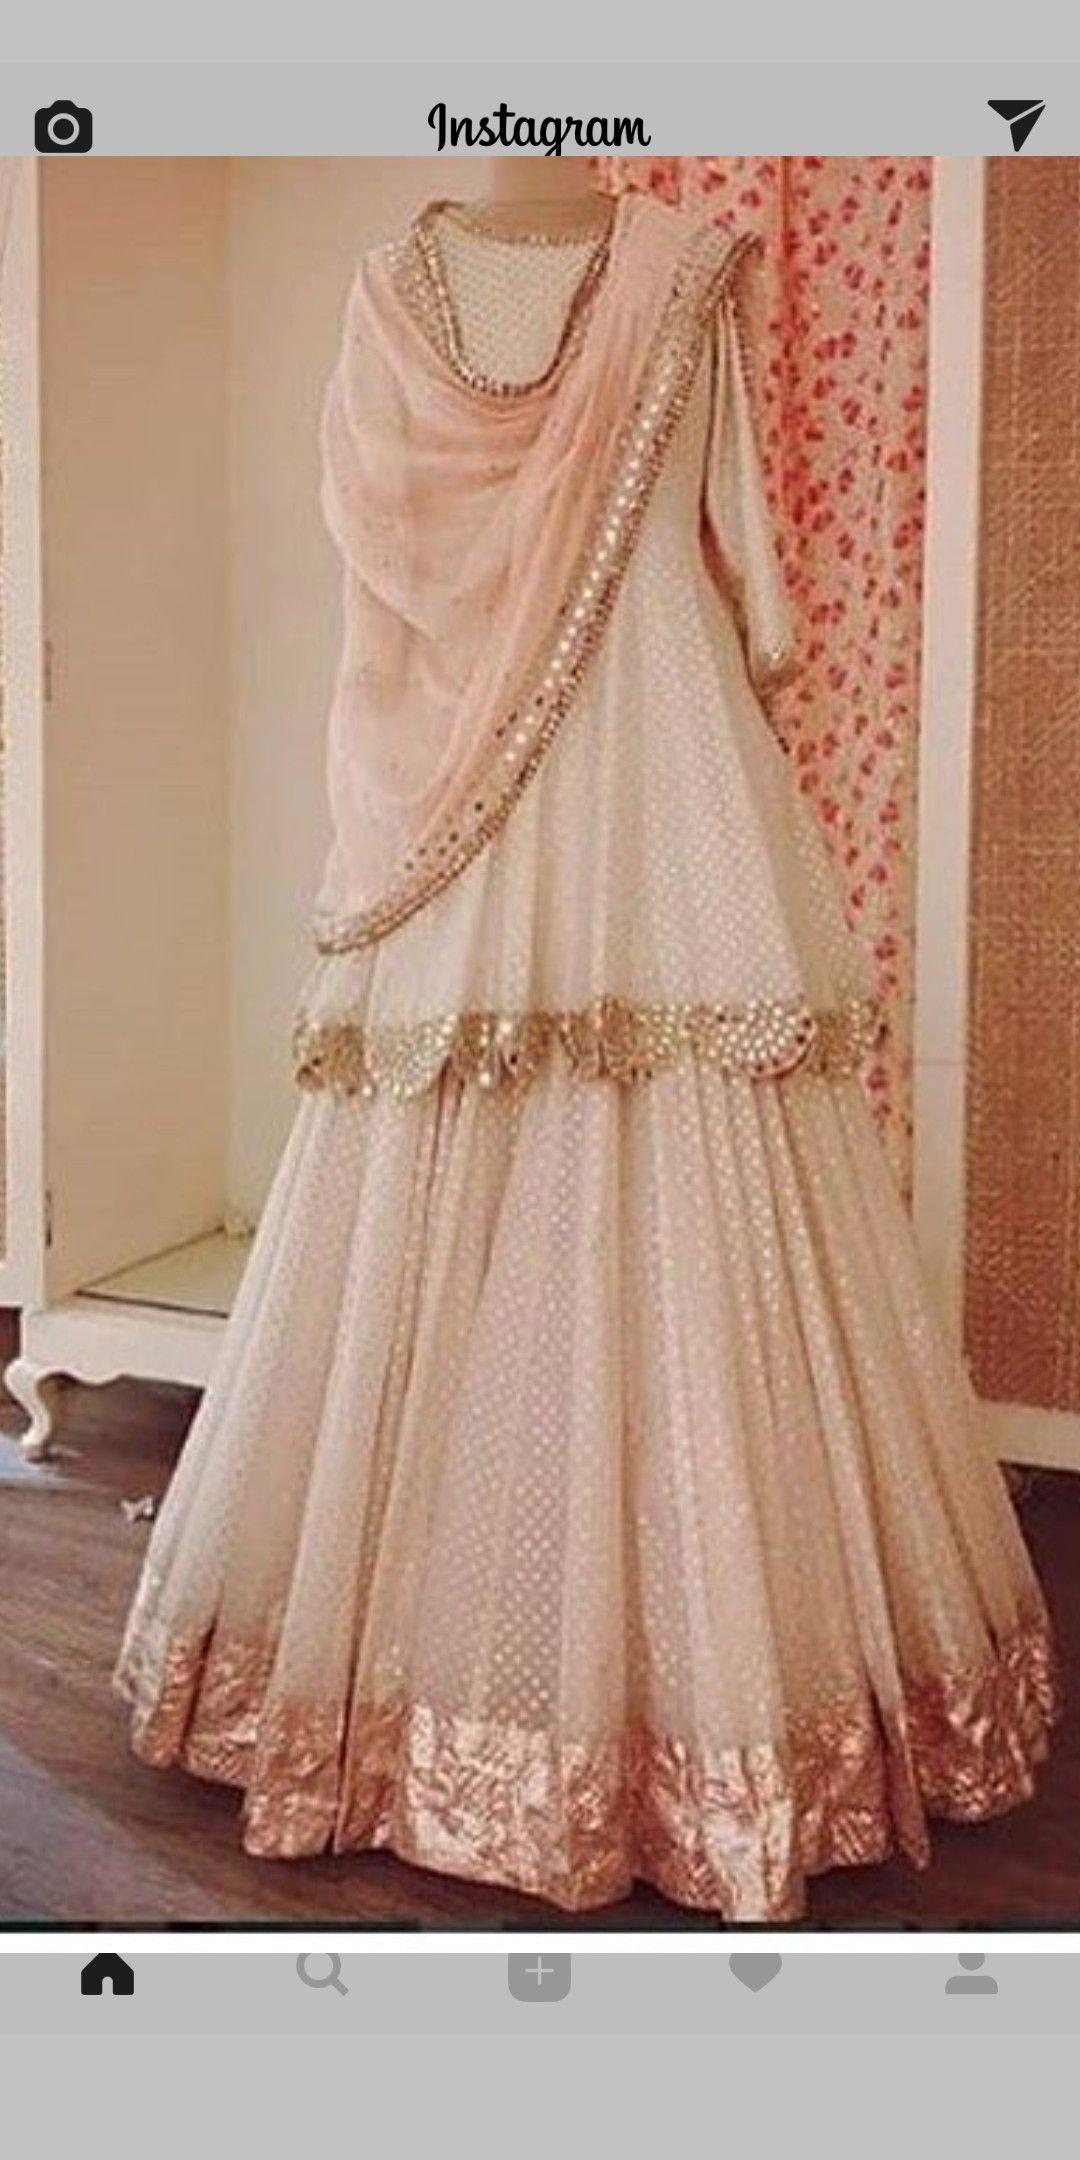 44f608fa19 Custom made lehenga Inquiries➡ nivetasfashion@gmail.com whatsapp + 917696747289 Nivetas Design Studio We ship worldwide delivery world wide  #bridal ...